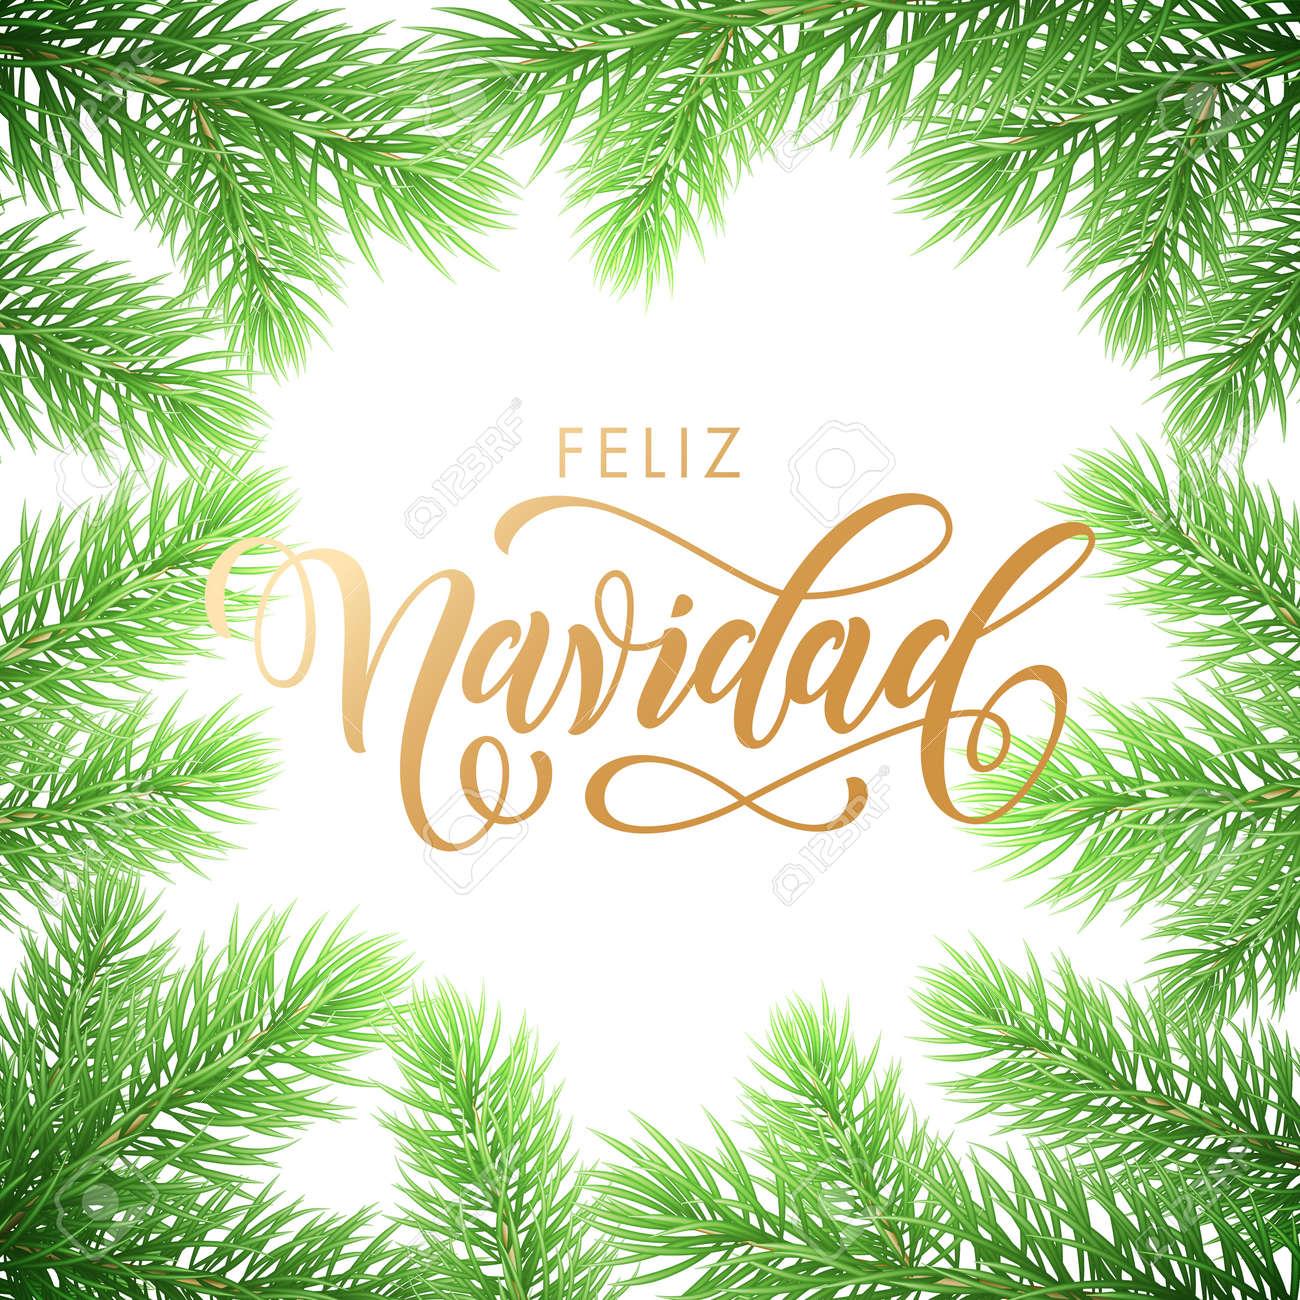 Feliz Navidad Cristmas.Feliz Navidad Spanish Merry Christmas Holiday Golden Hand Drawn